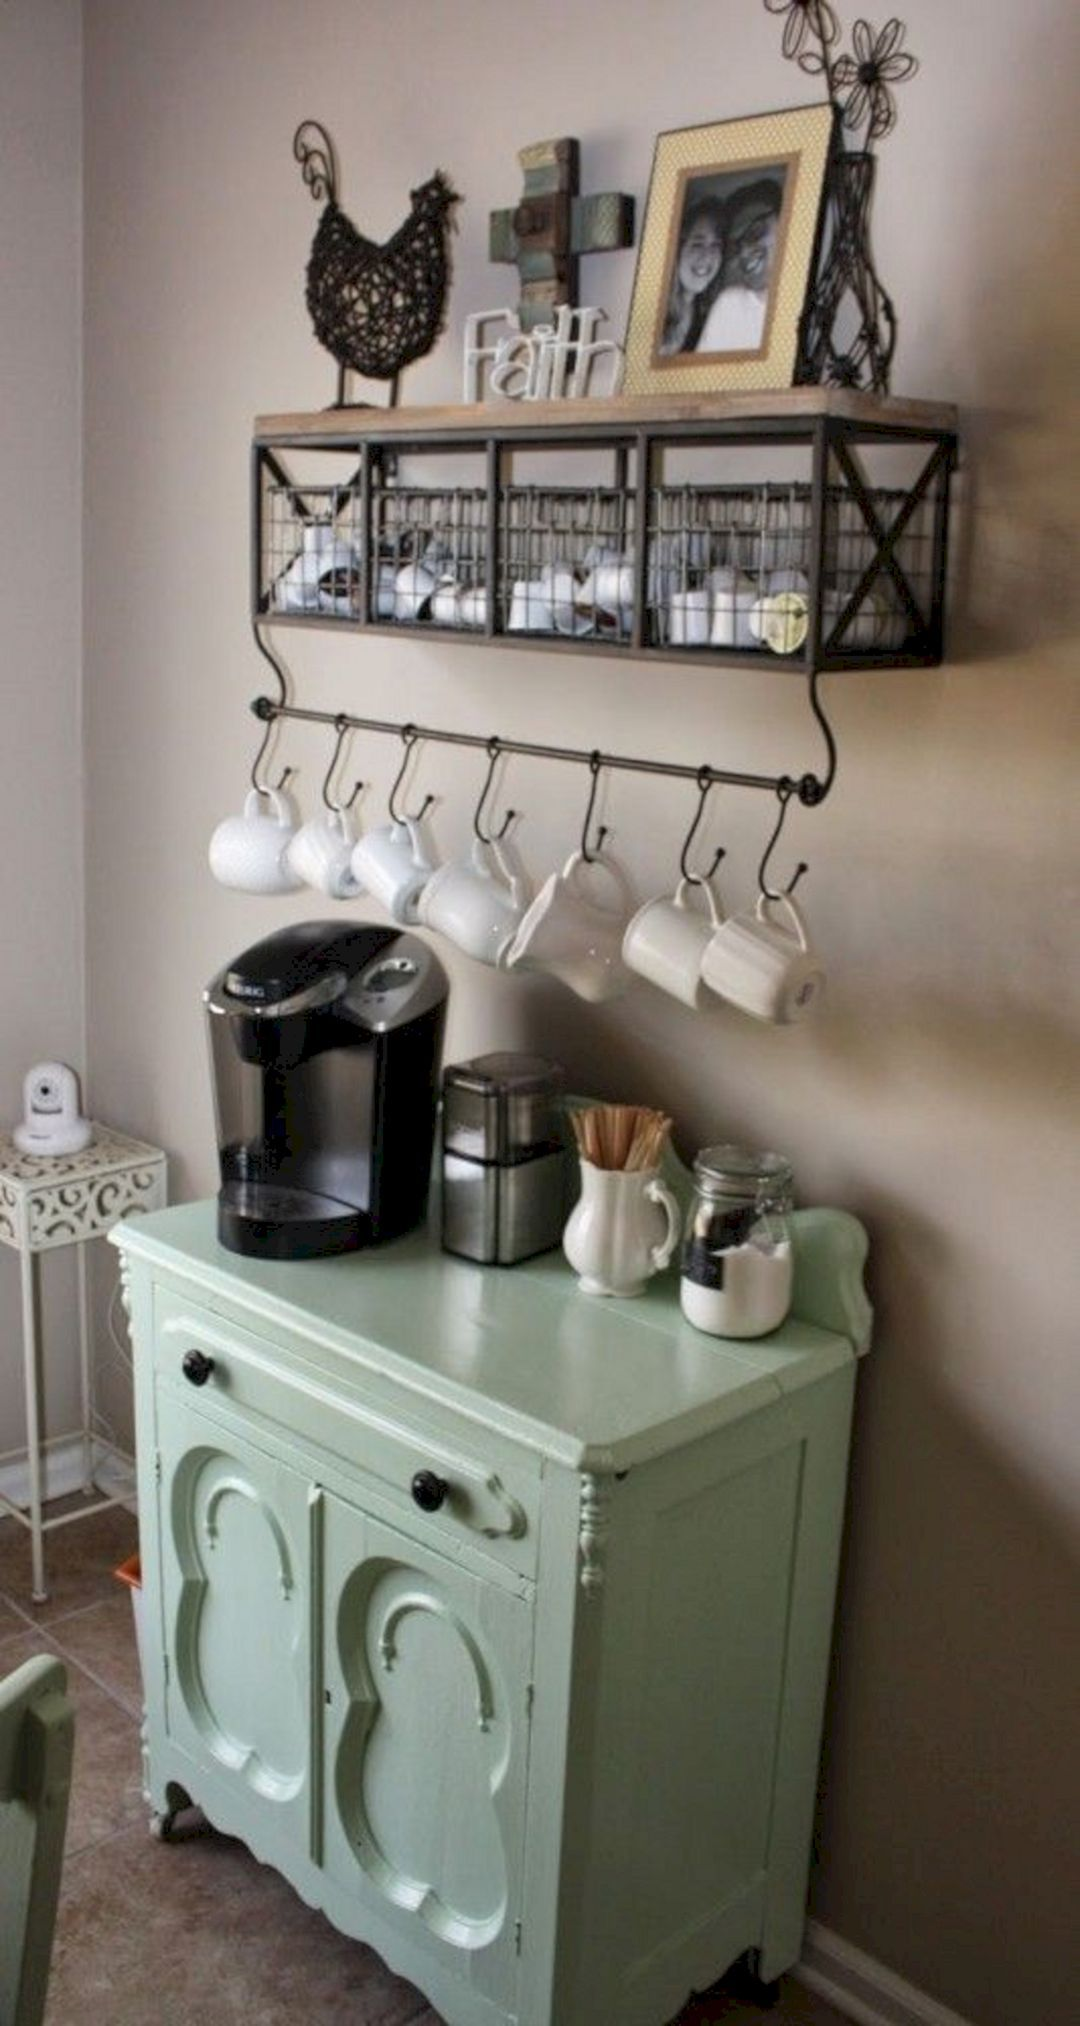 45+ Awesome Farmhouse Decor Ideas On A Budget